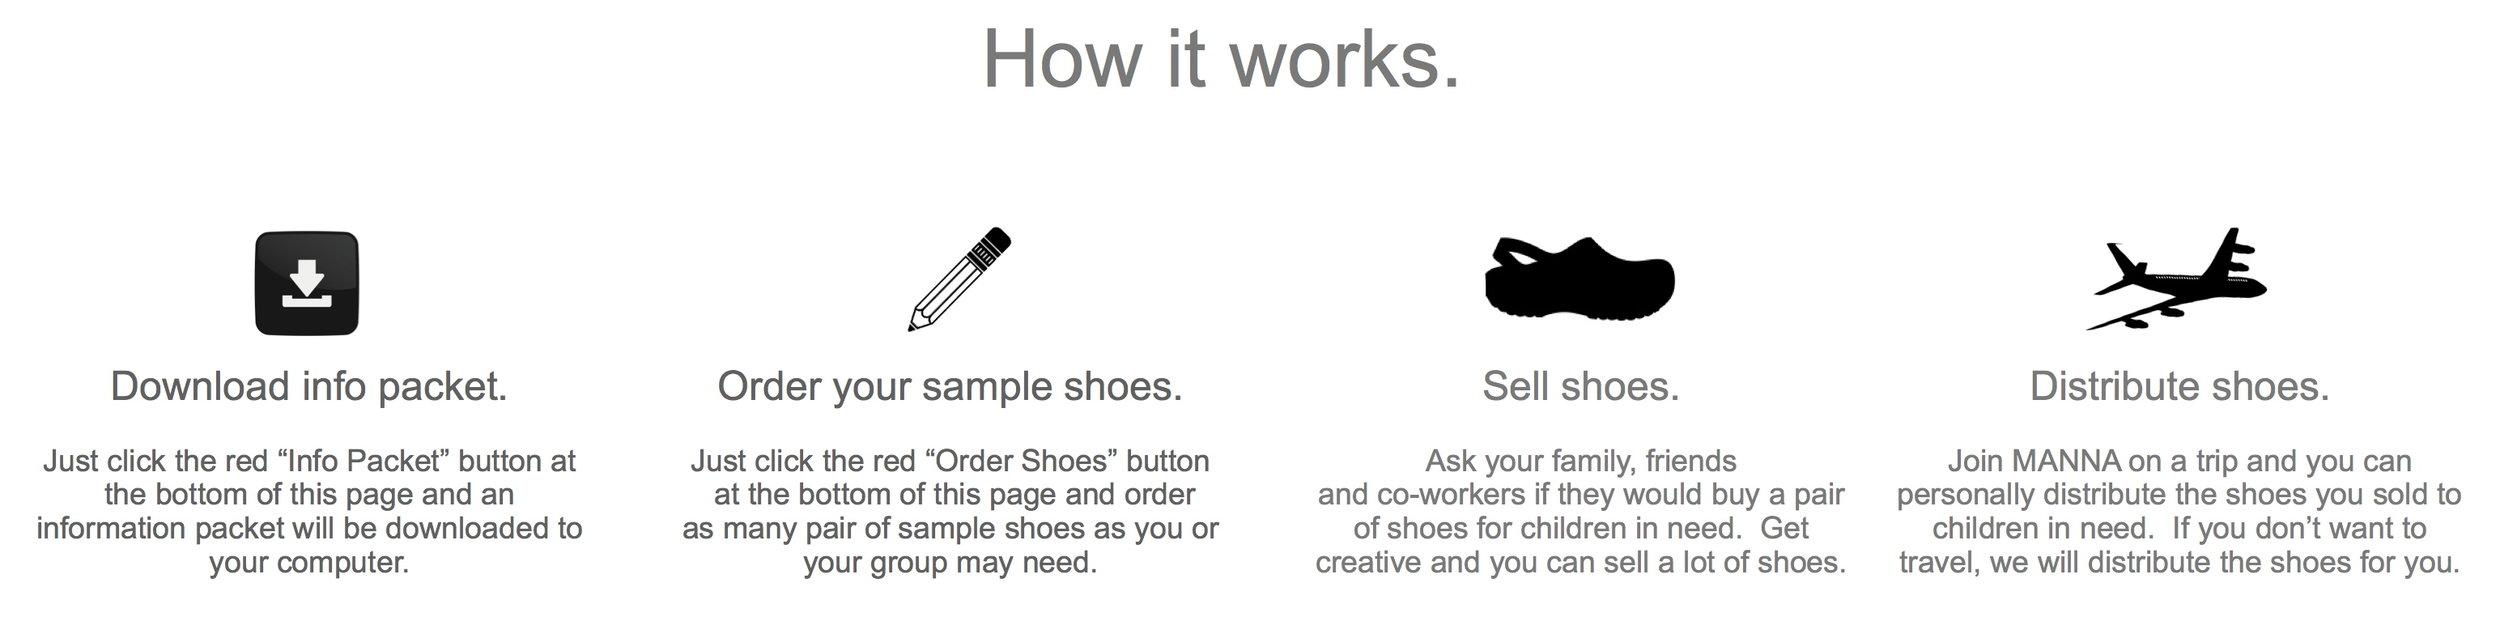 how it works Shoe Unto Others slide  copy.jpg